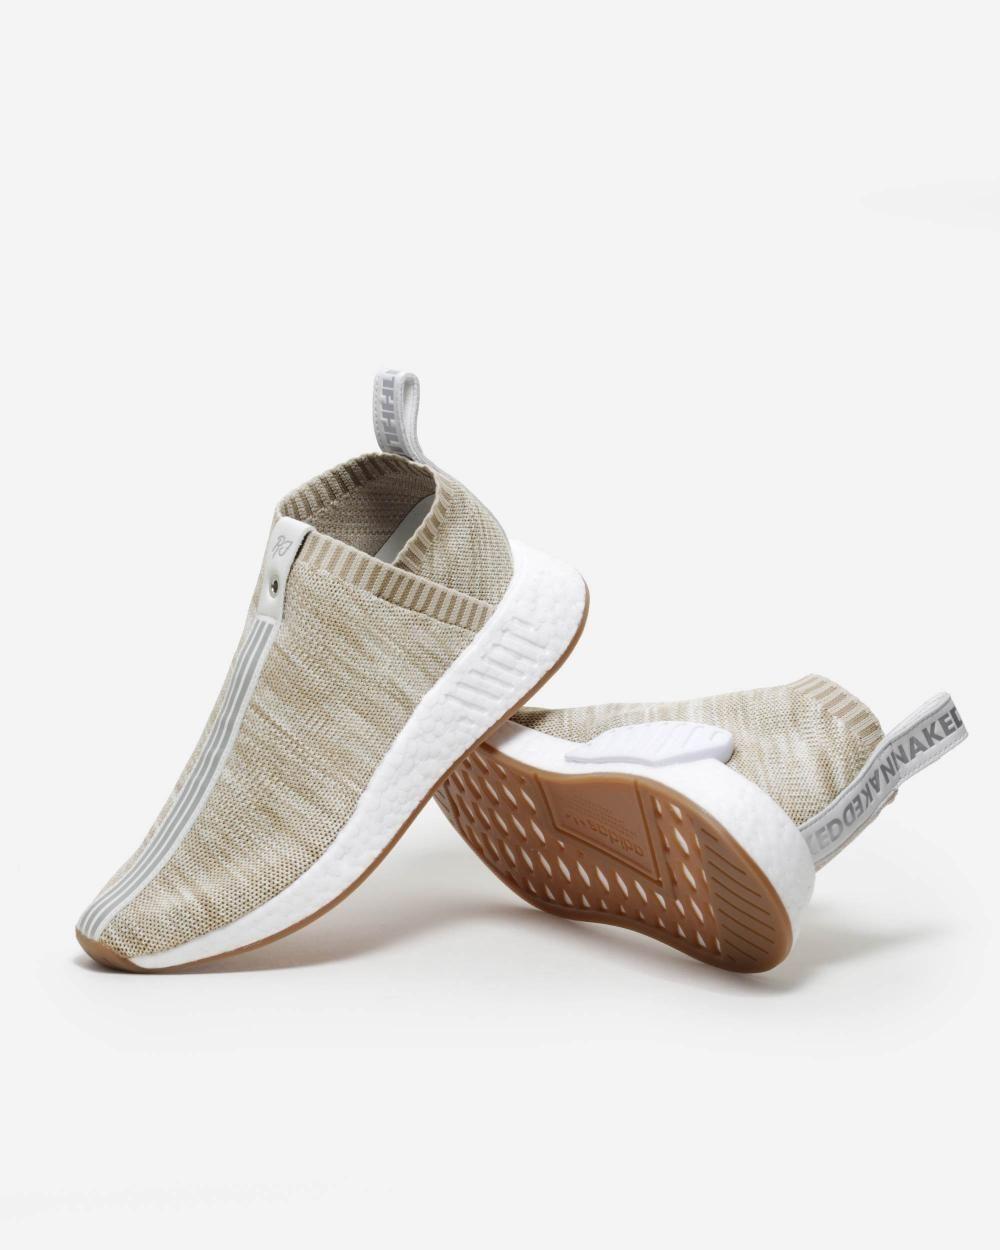 adidas nmd cs2 womens silver